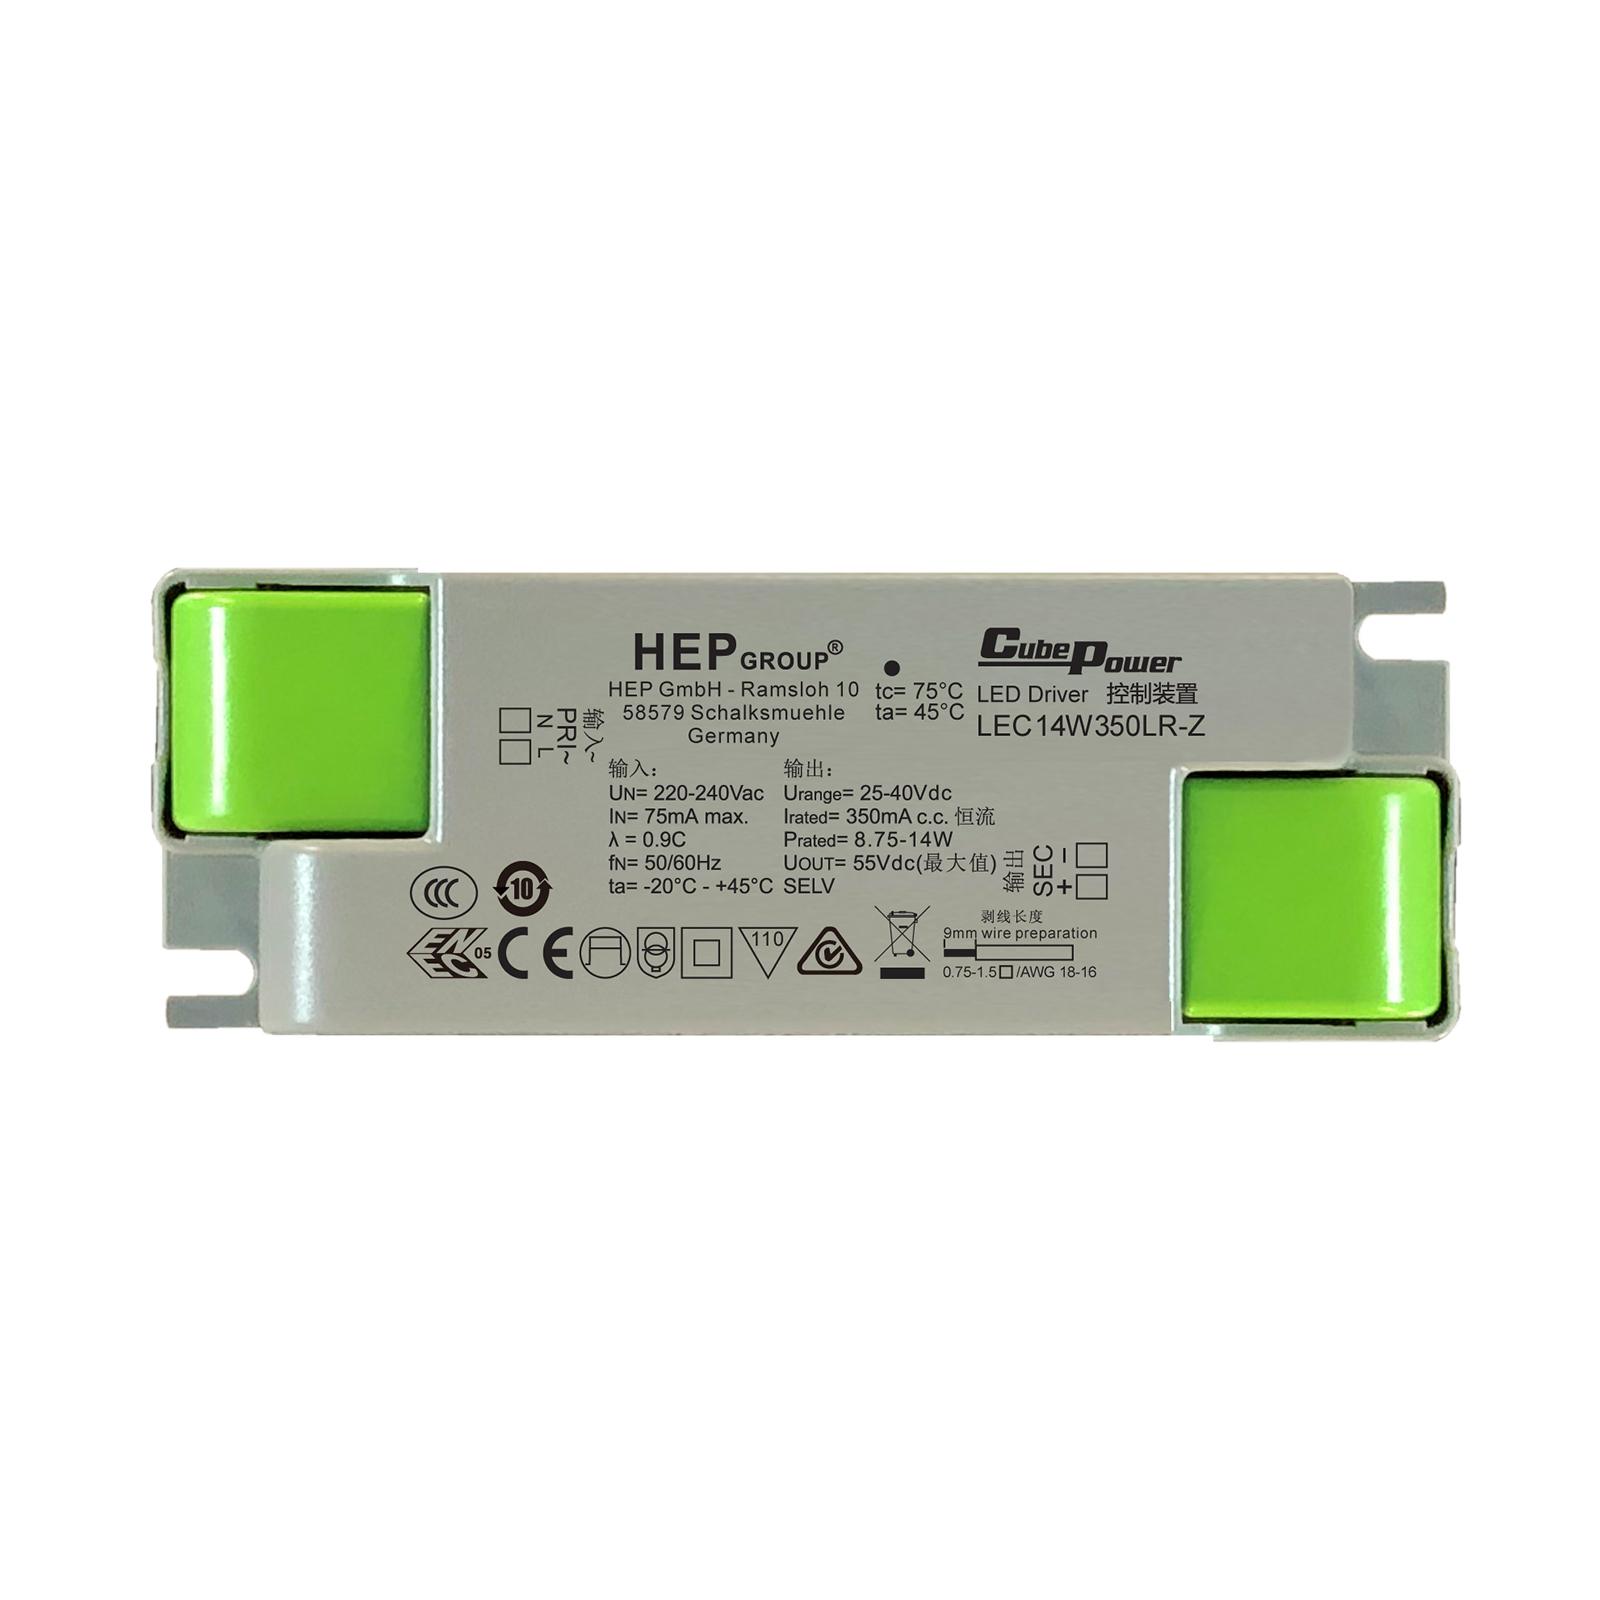 LED-Treiber LEC, 14 W, 350 mA, CC